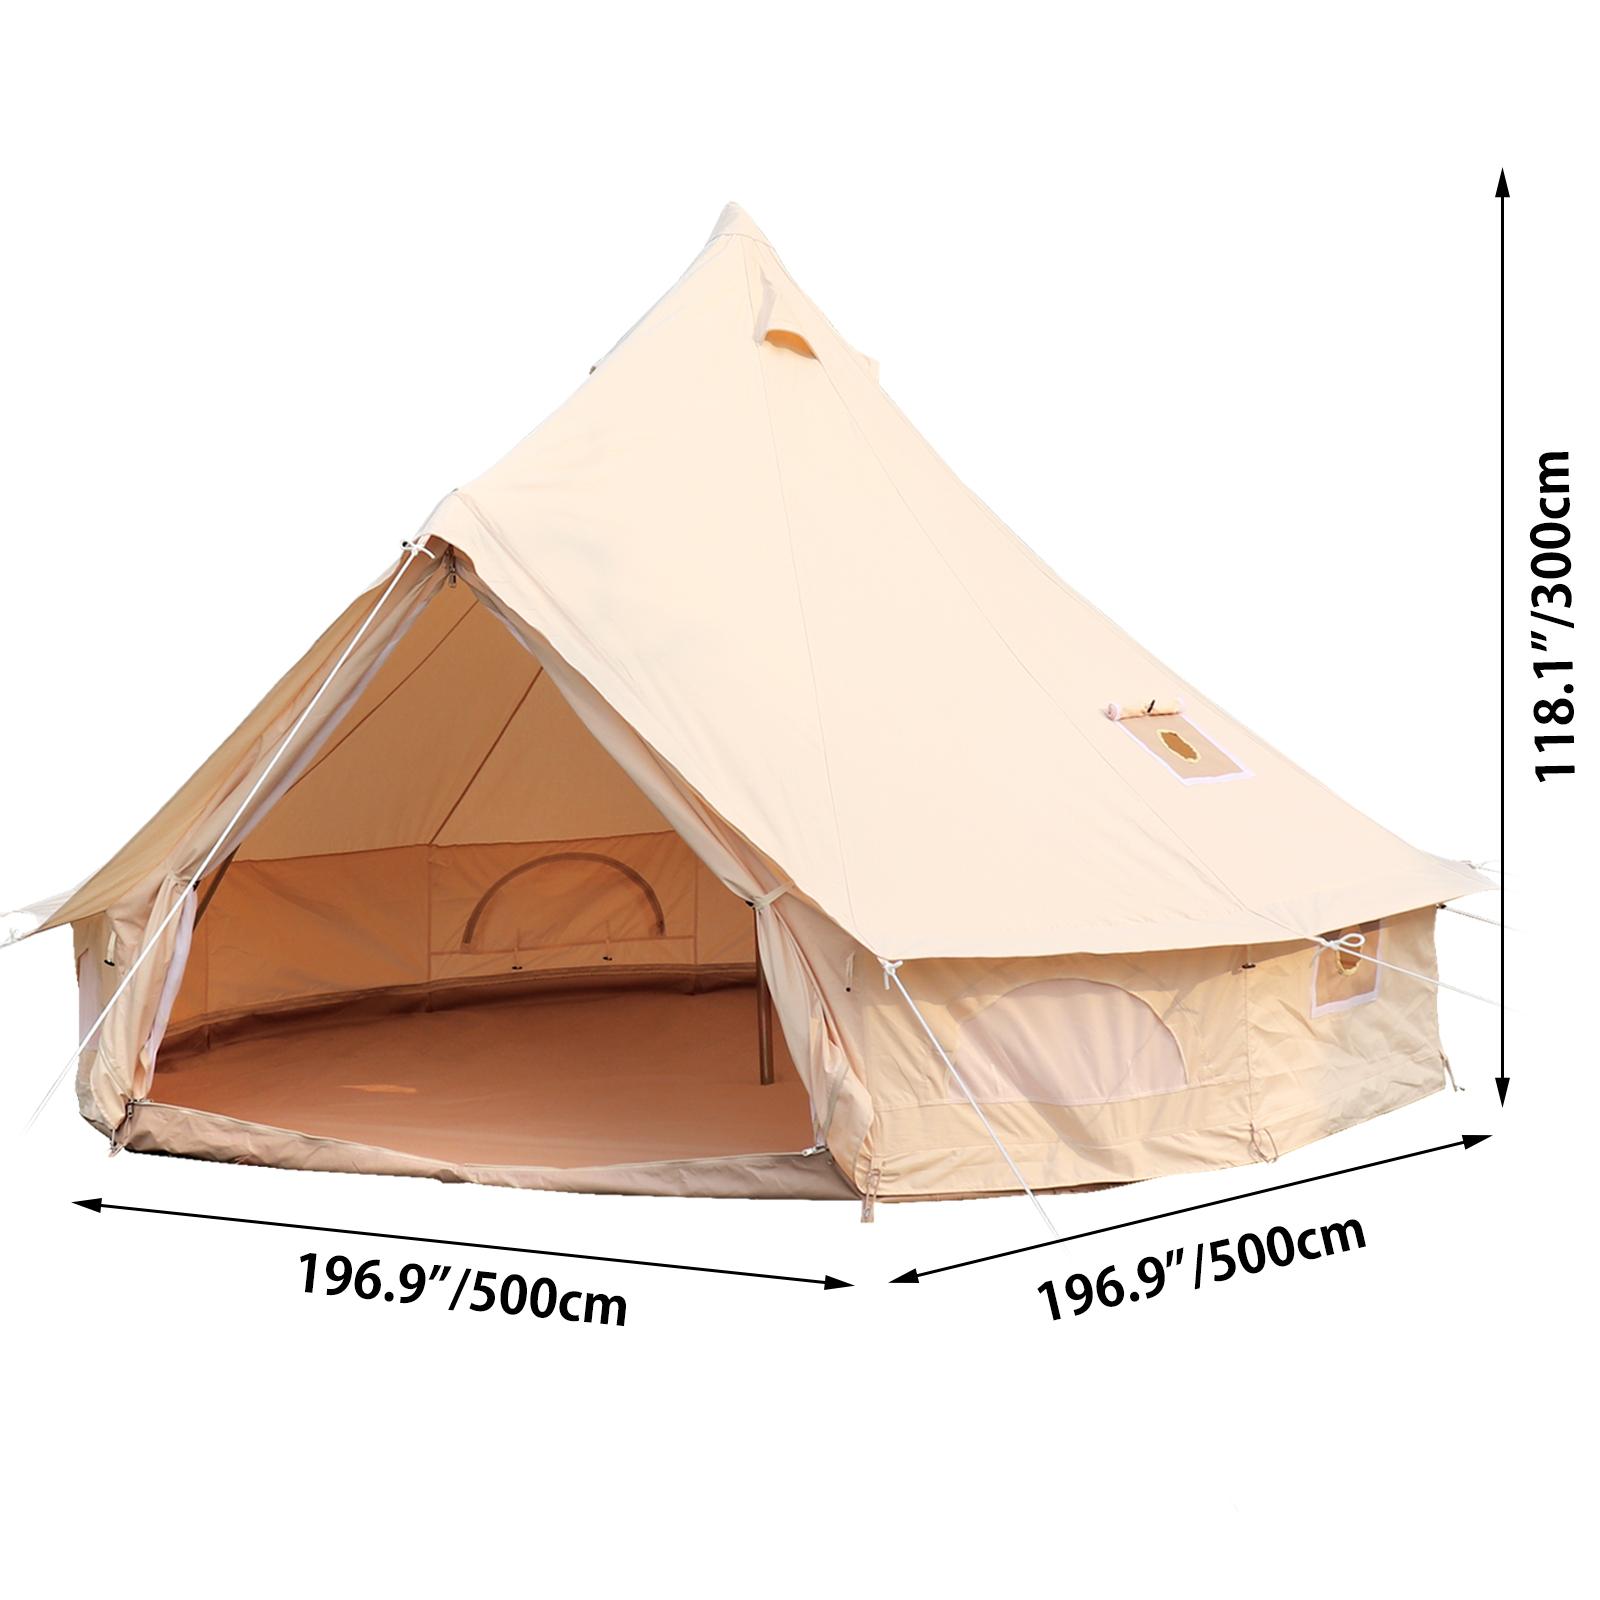 4-Season-Bell-Tent-3-4-5-6M-Waterproof-Cotton-Canvas-Glamping-Camping-Beach-US thumbnail 44